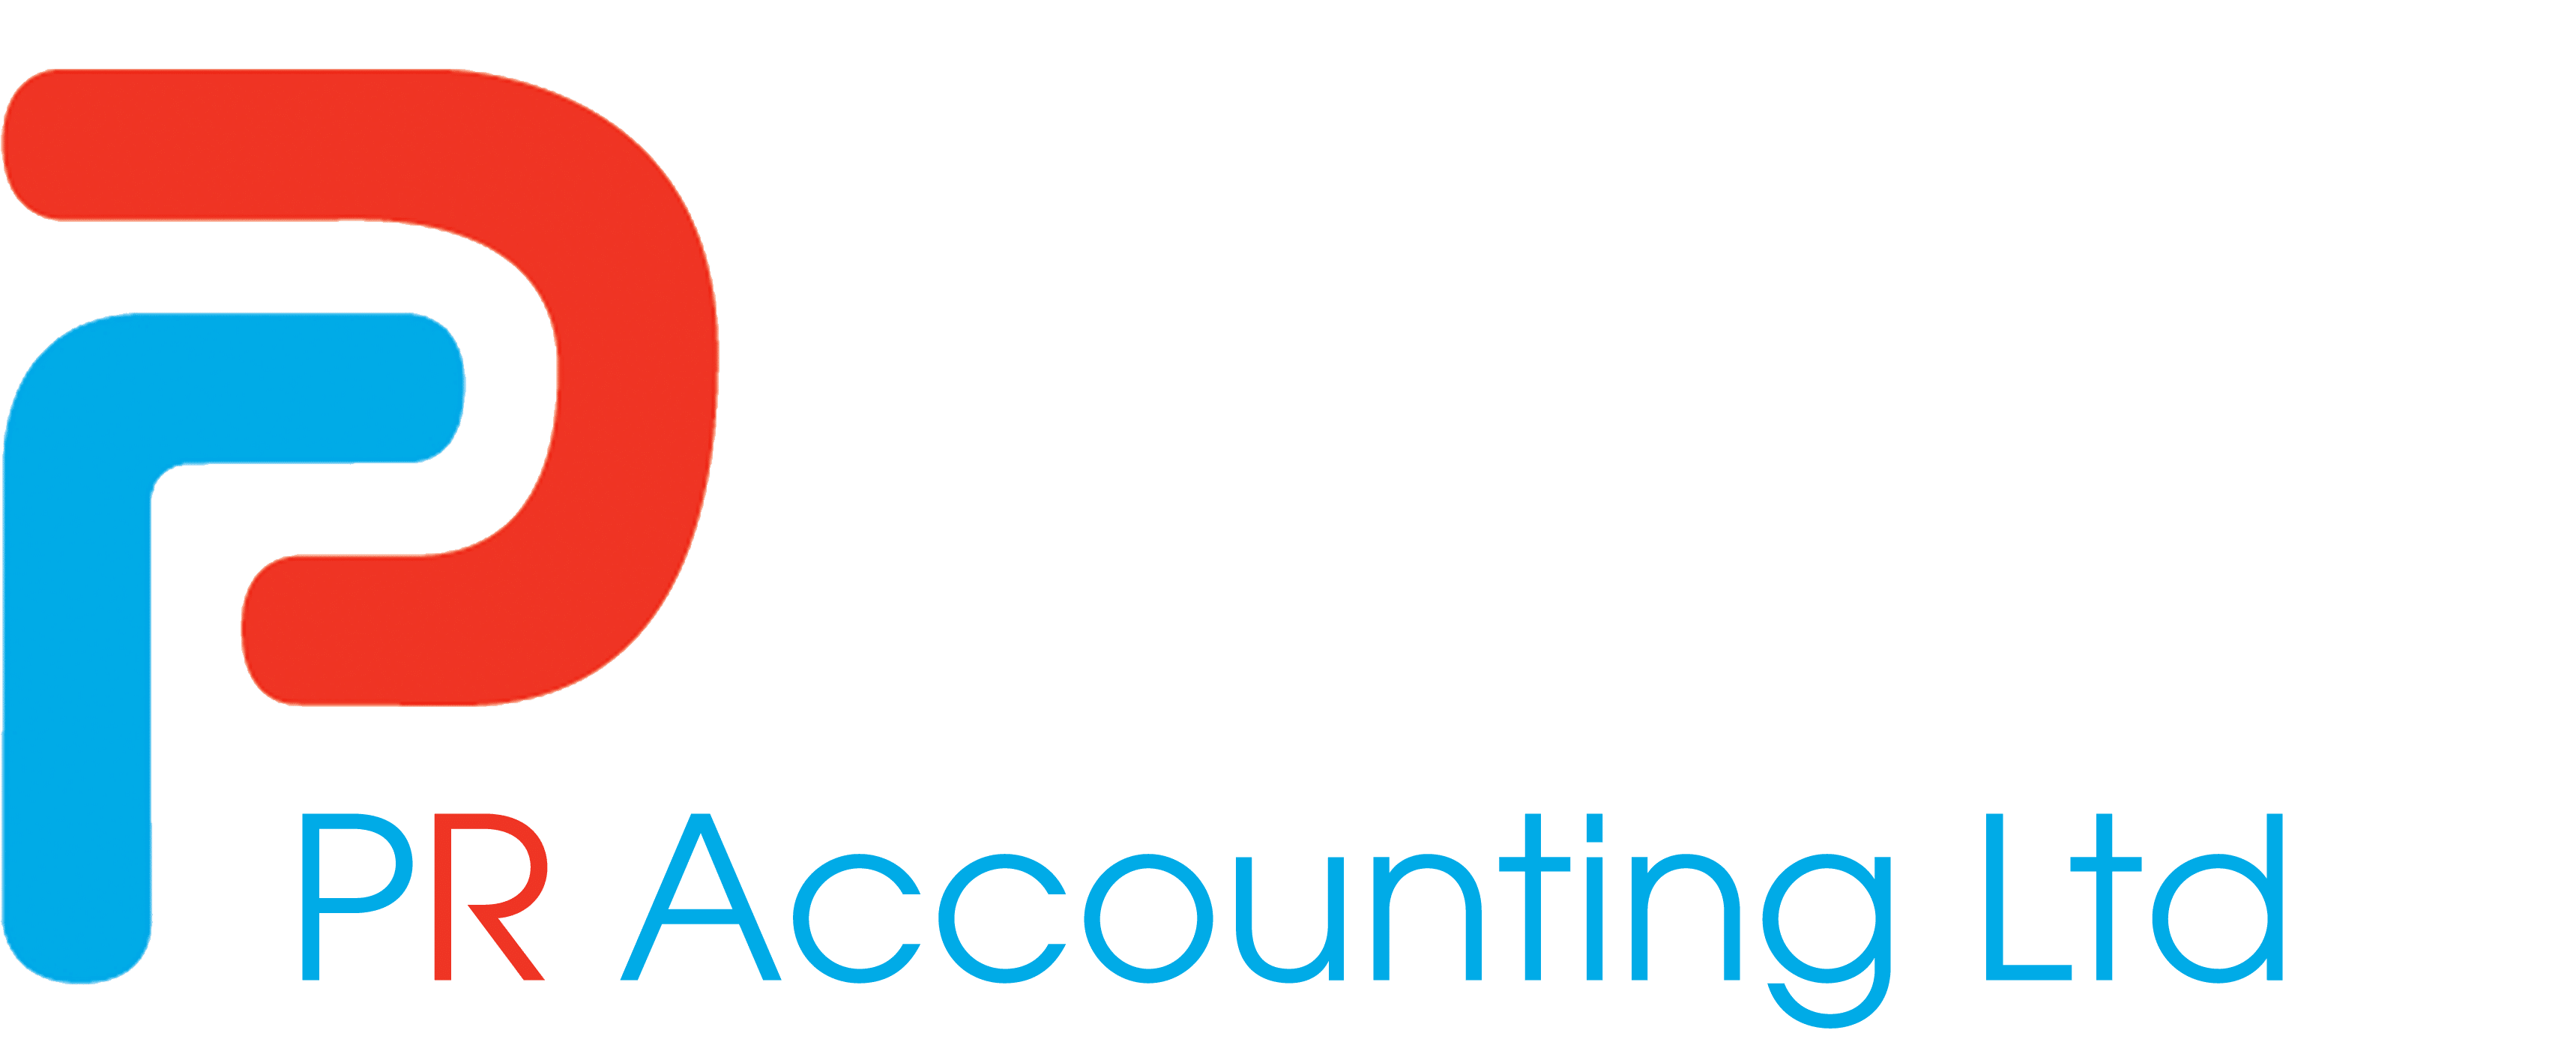 PR Accounting